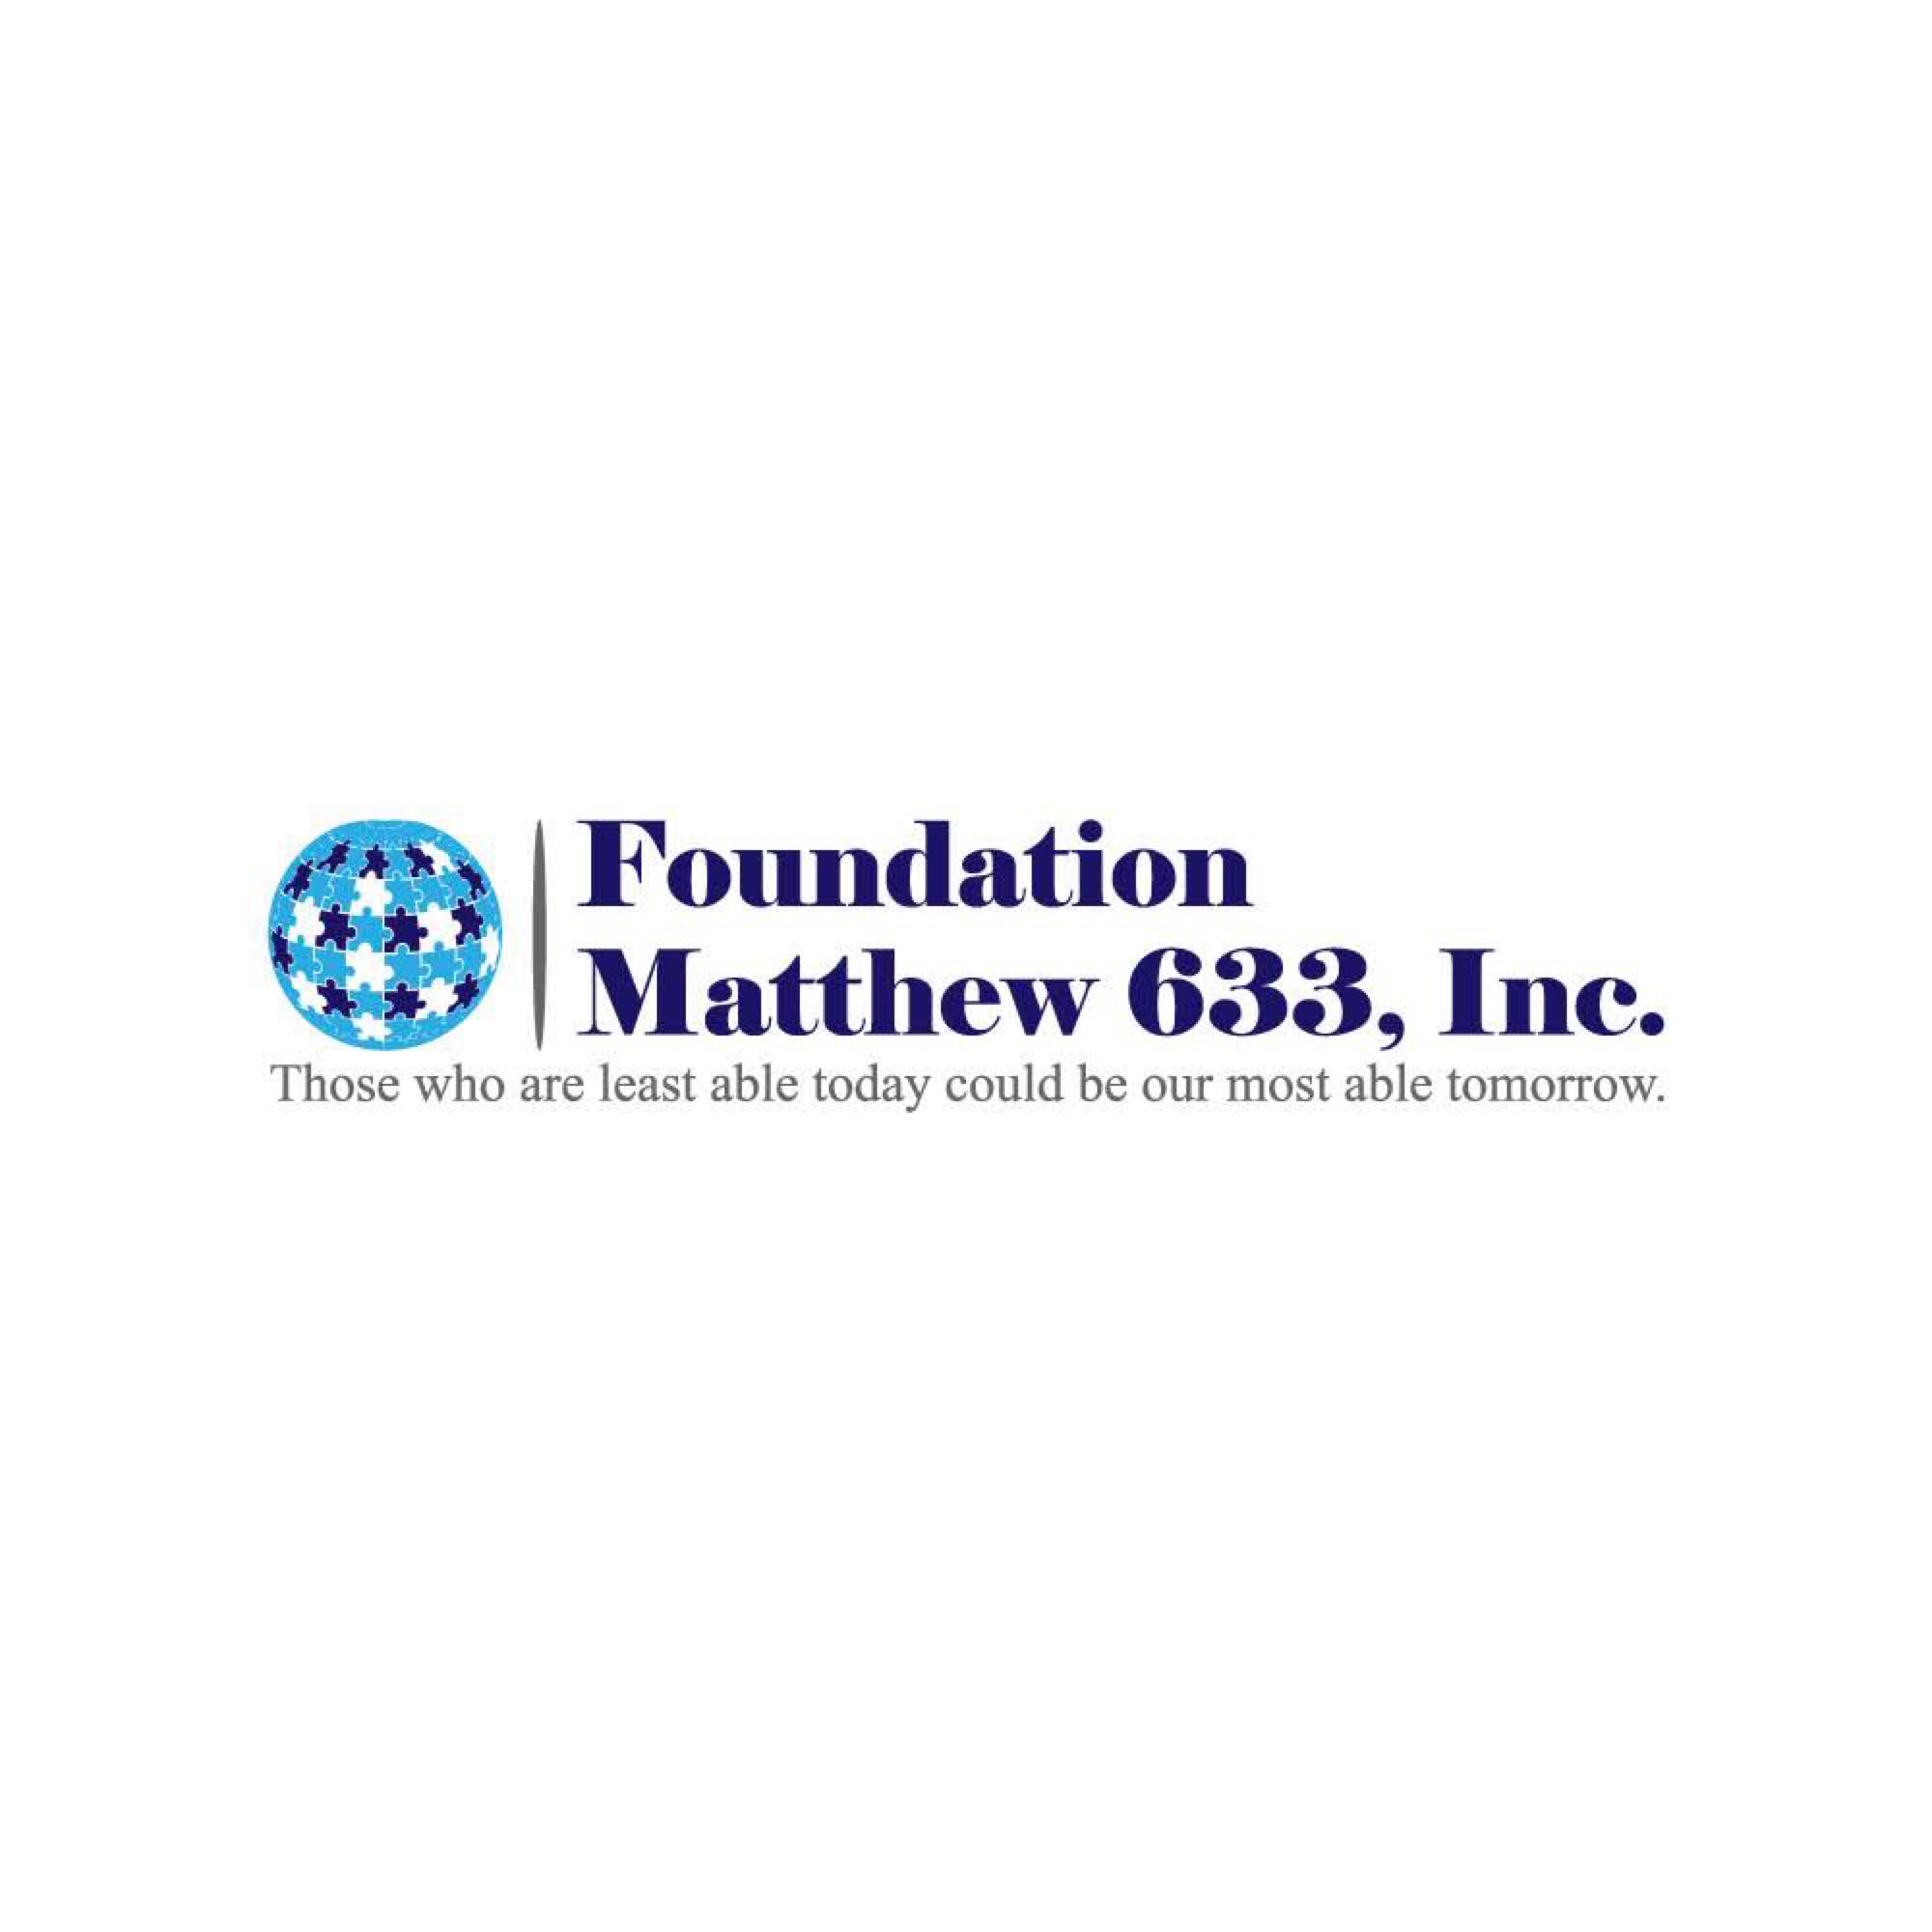 Foundation Matthew 633, Inc.